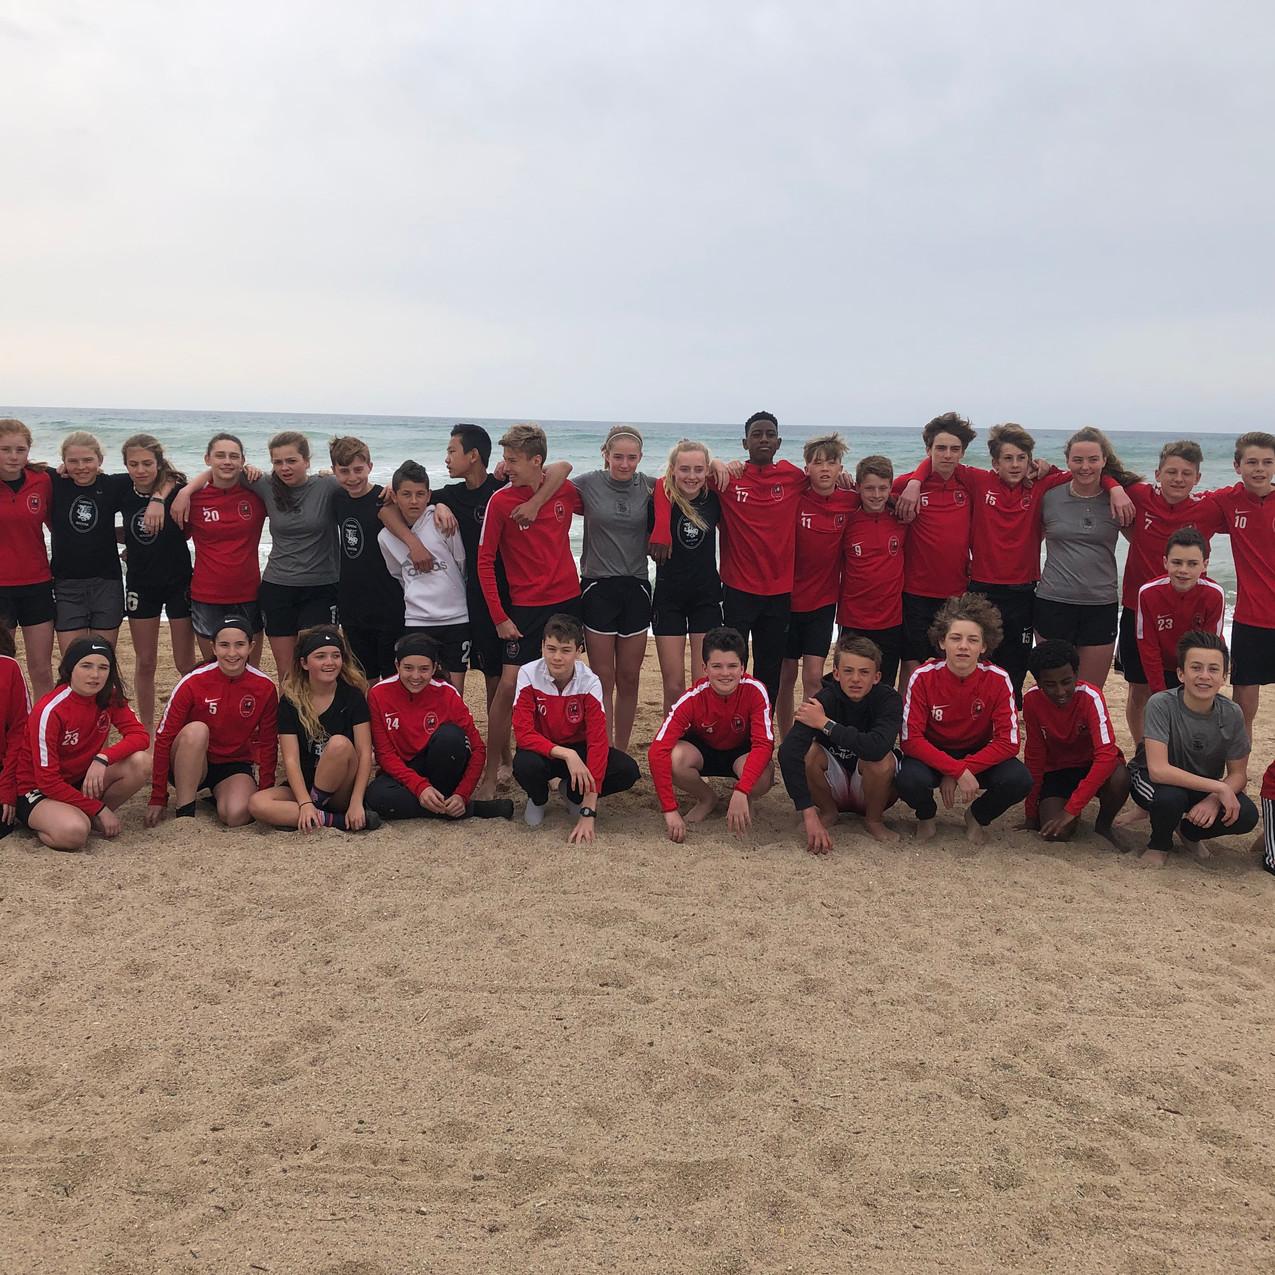 Capital Soccer Club